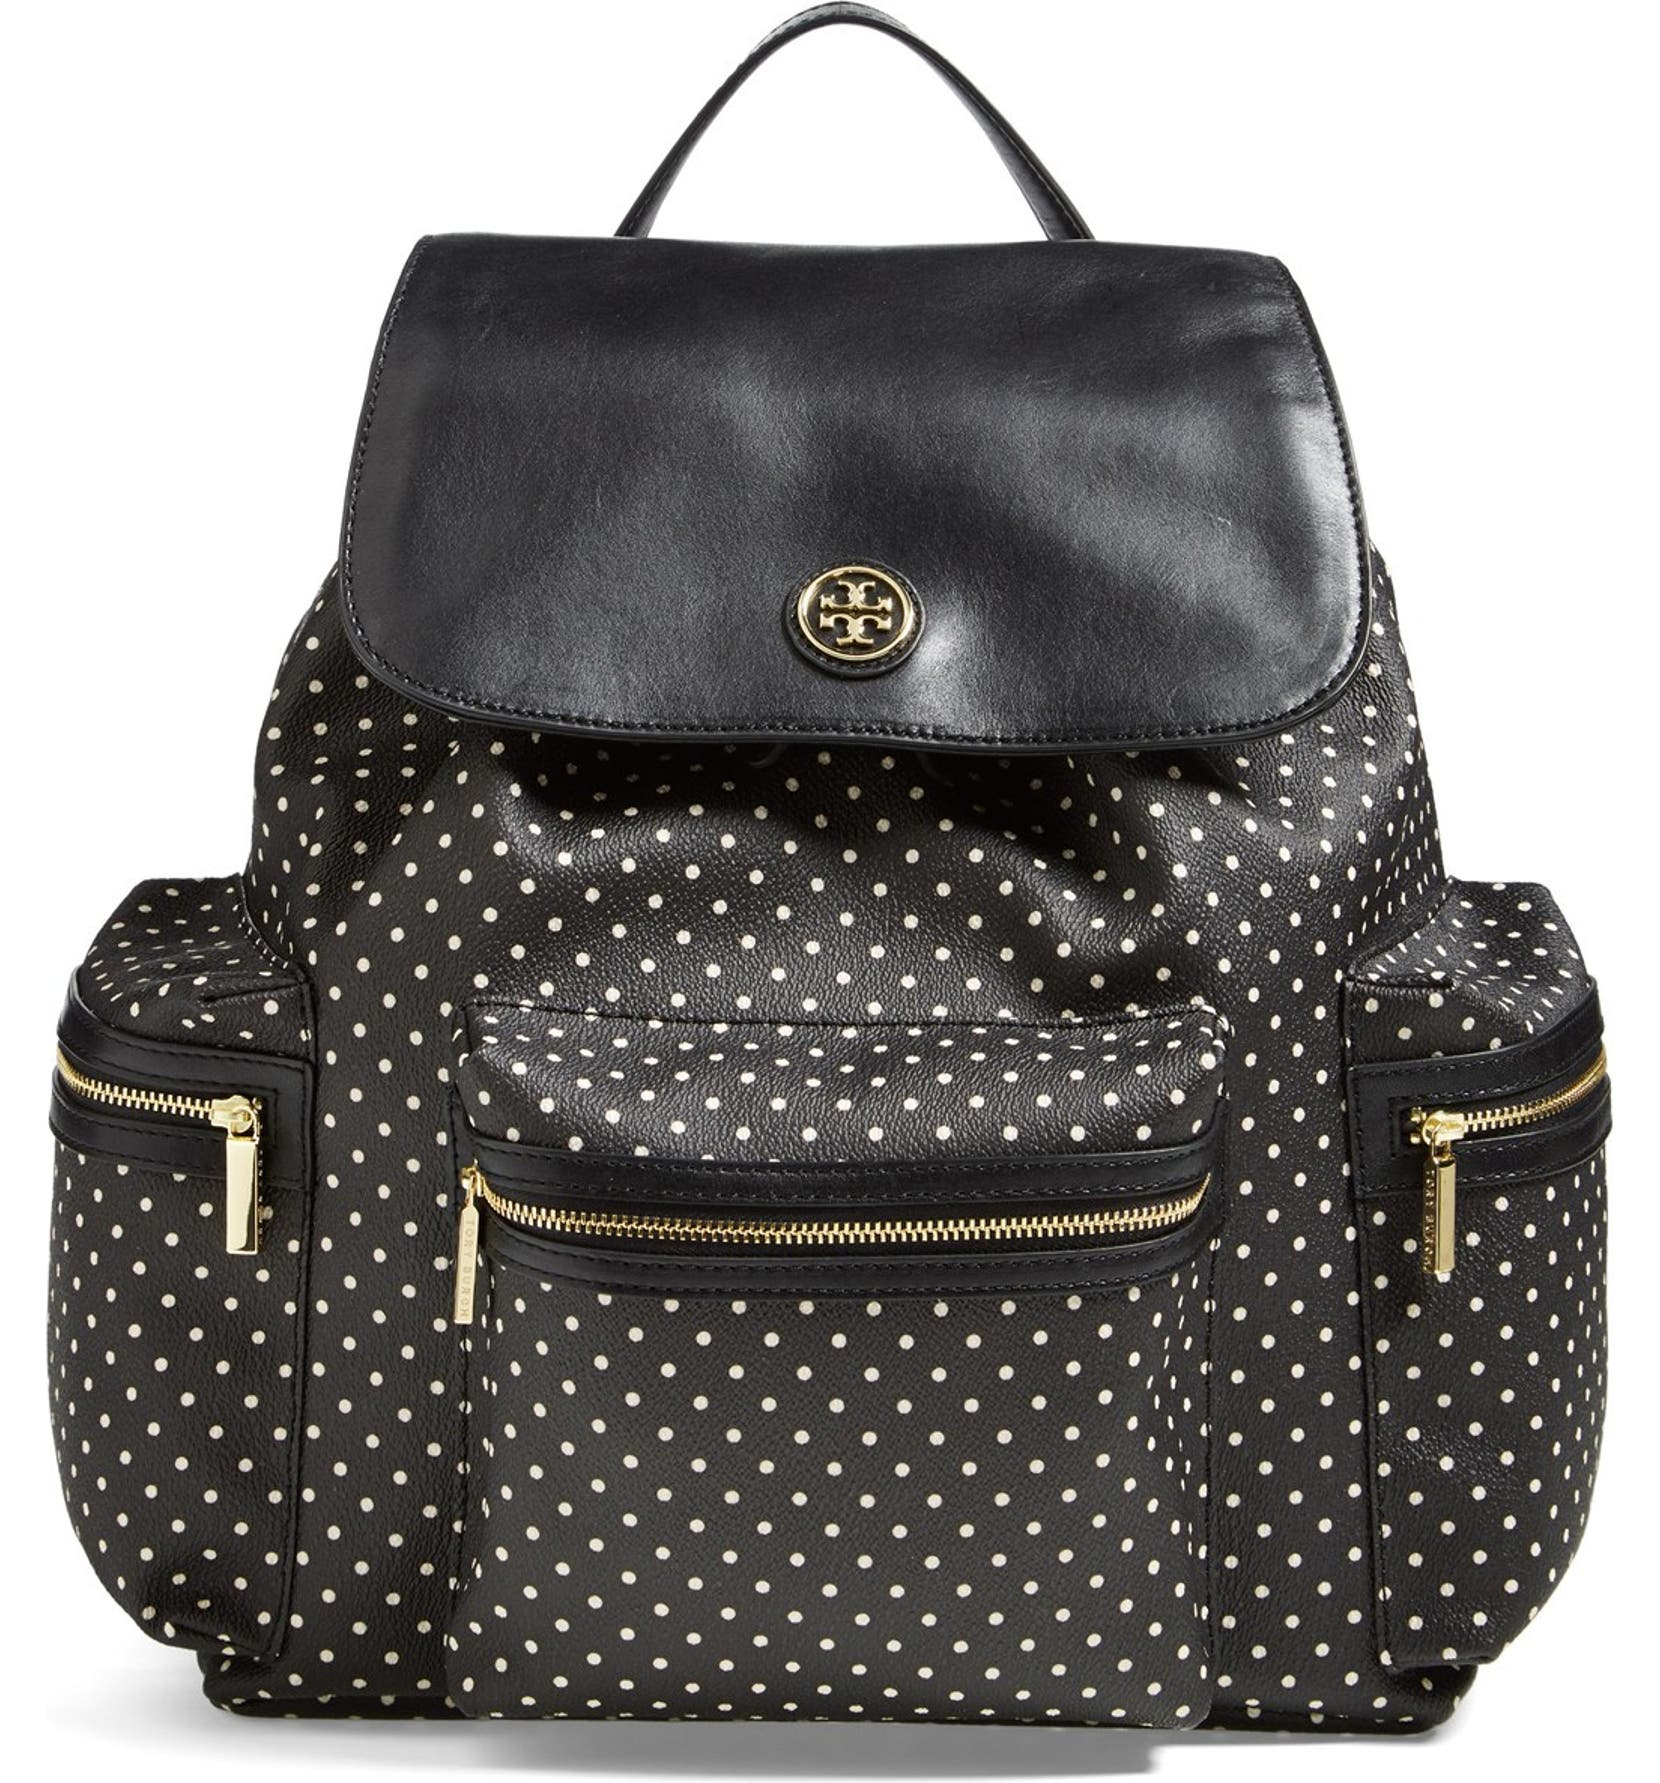 bd5d8dec4527 Tory Burch  Kerrington  Dot Print Flap Backpack